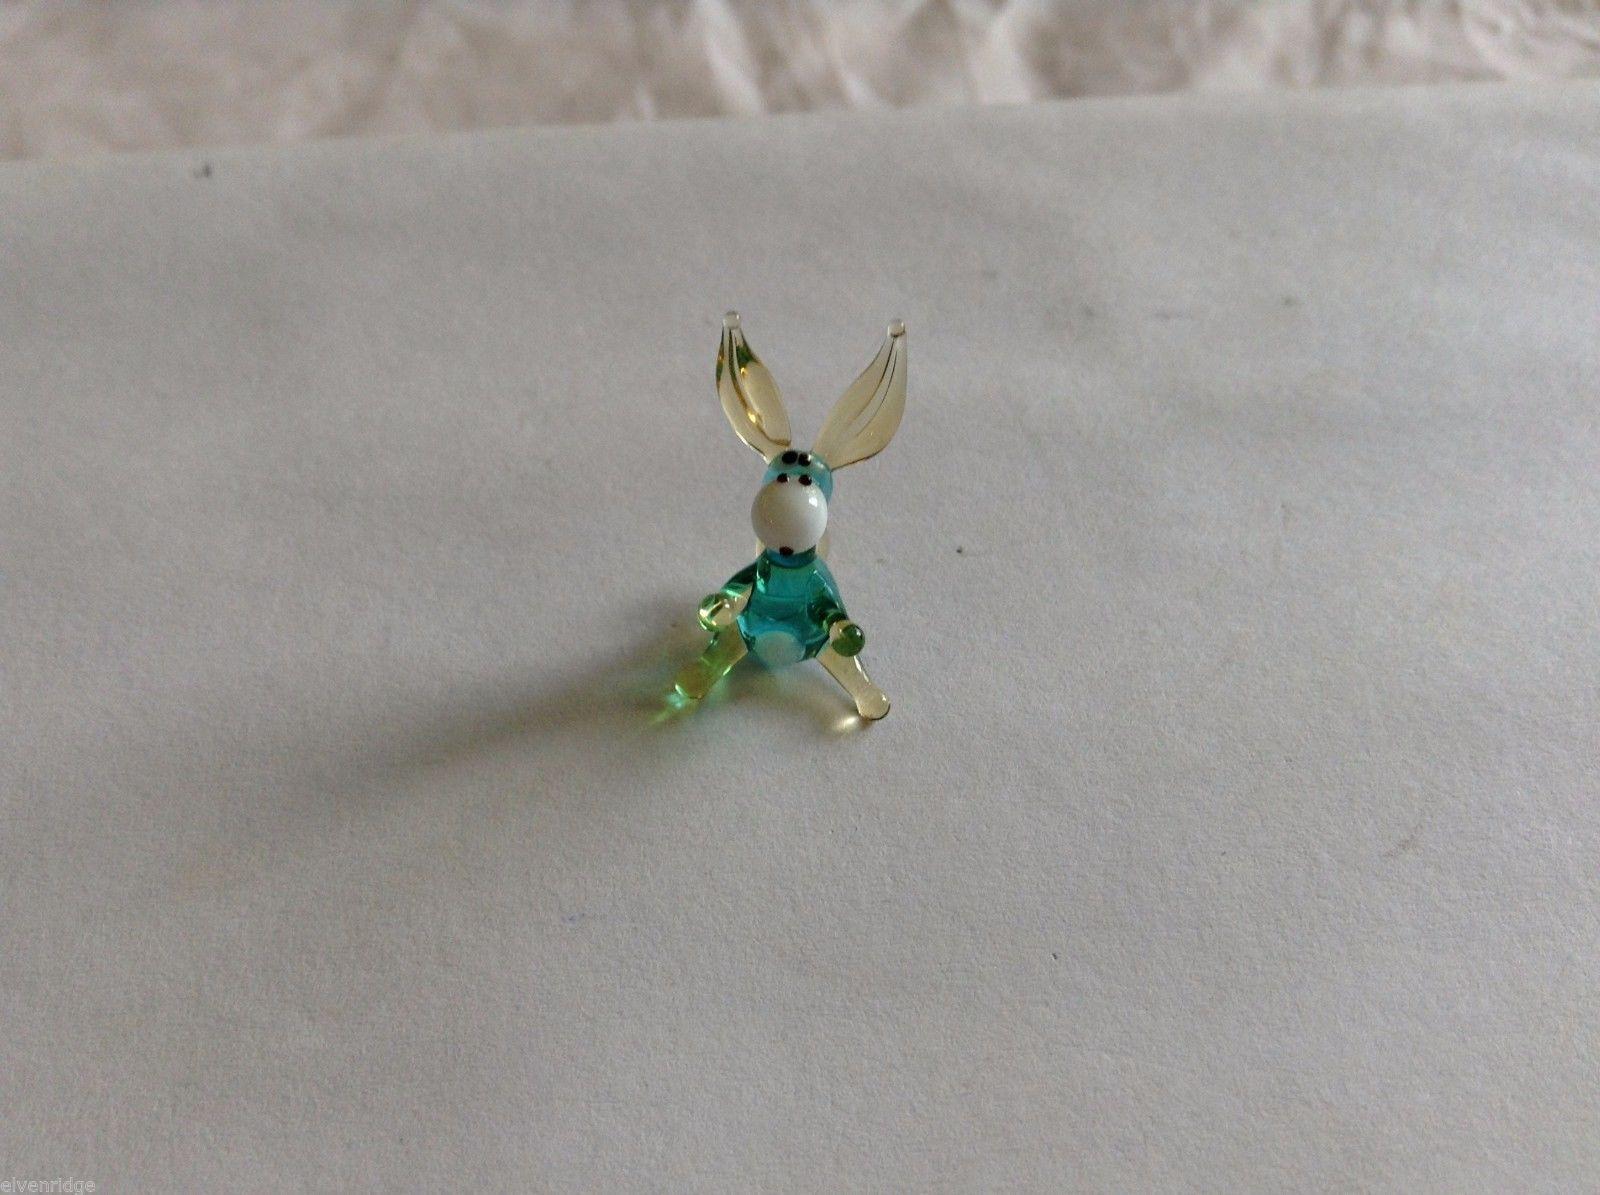 Micro Miniature hand blown glass made USA NIB blue donkey w long erect ears